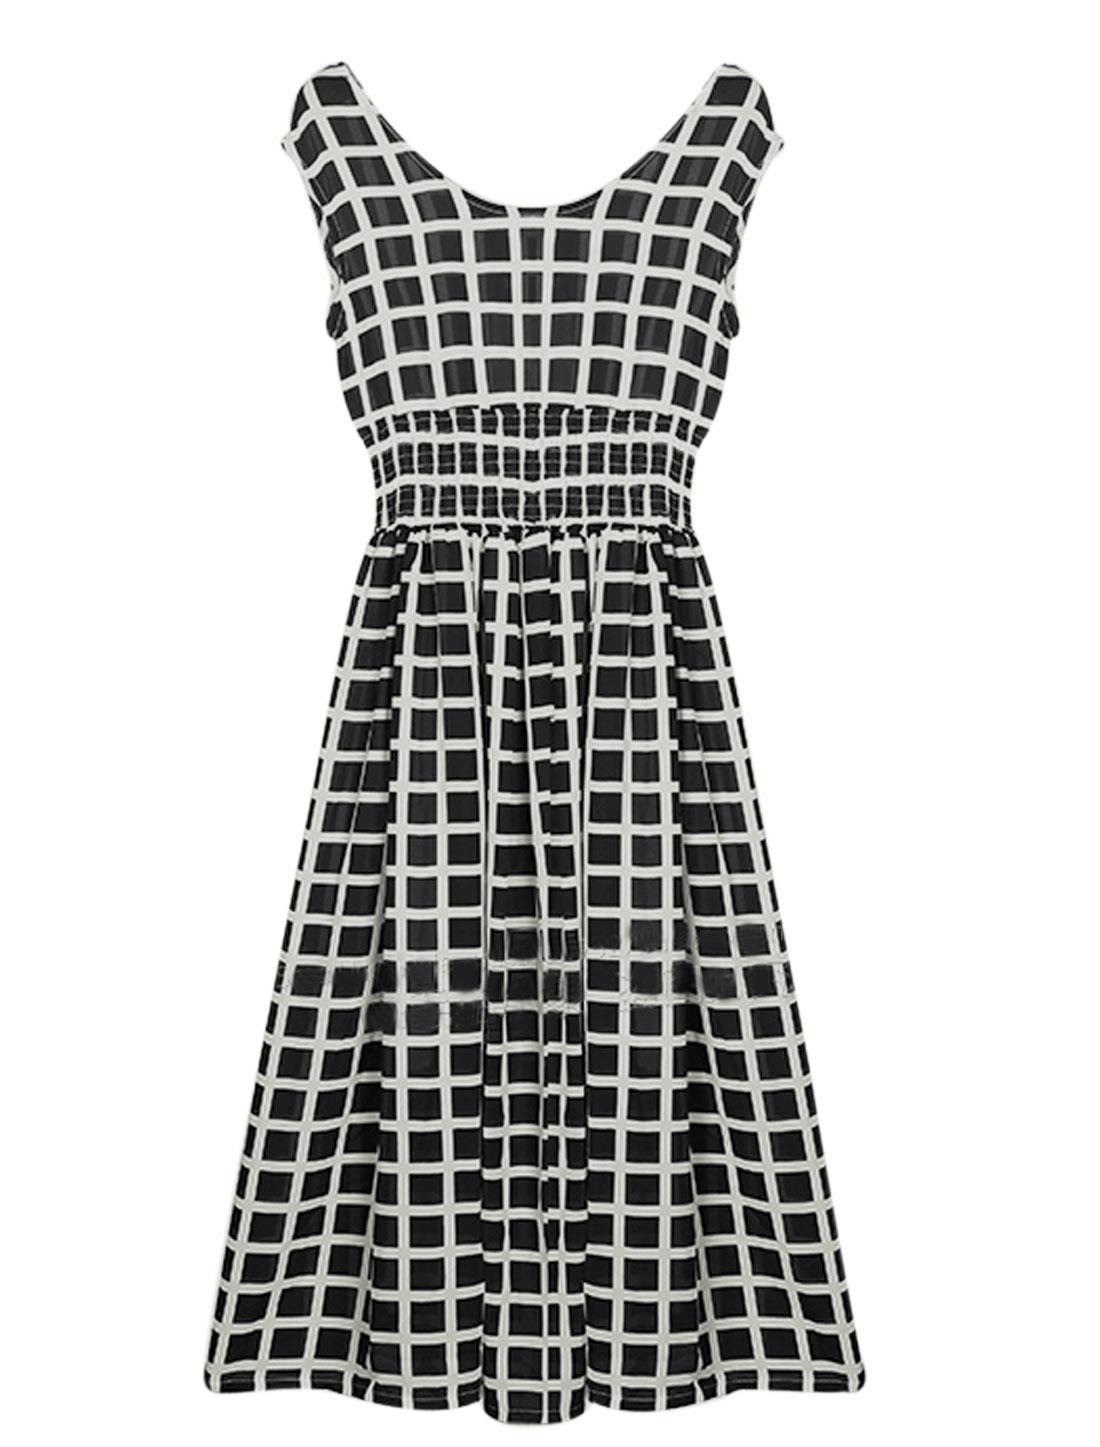 Lady Plaids Pattern Sleeveless Elastic Waist Casual Dress Black White M